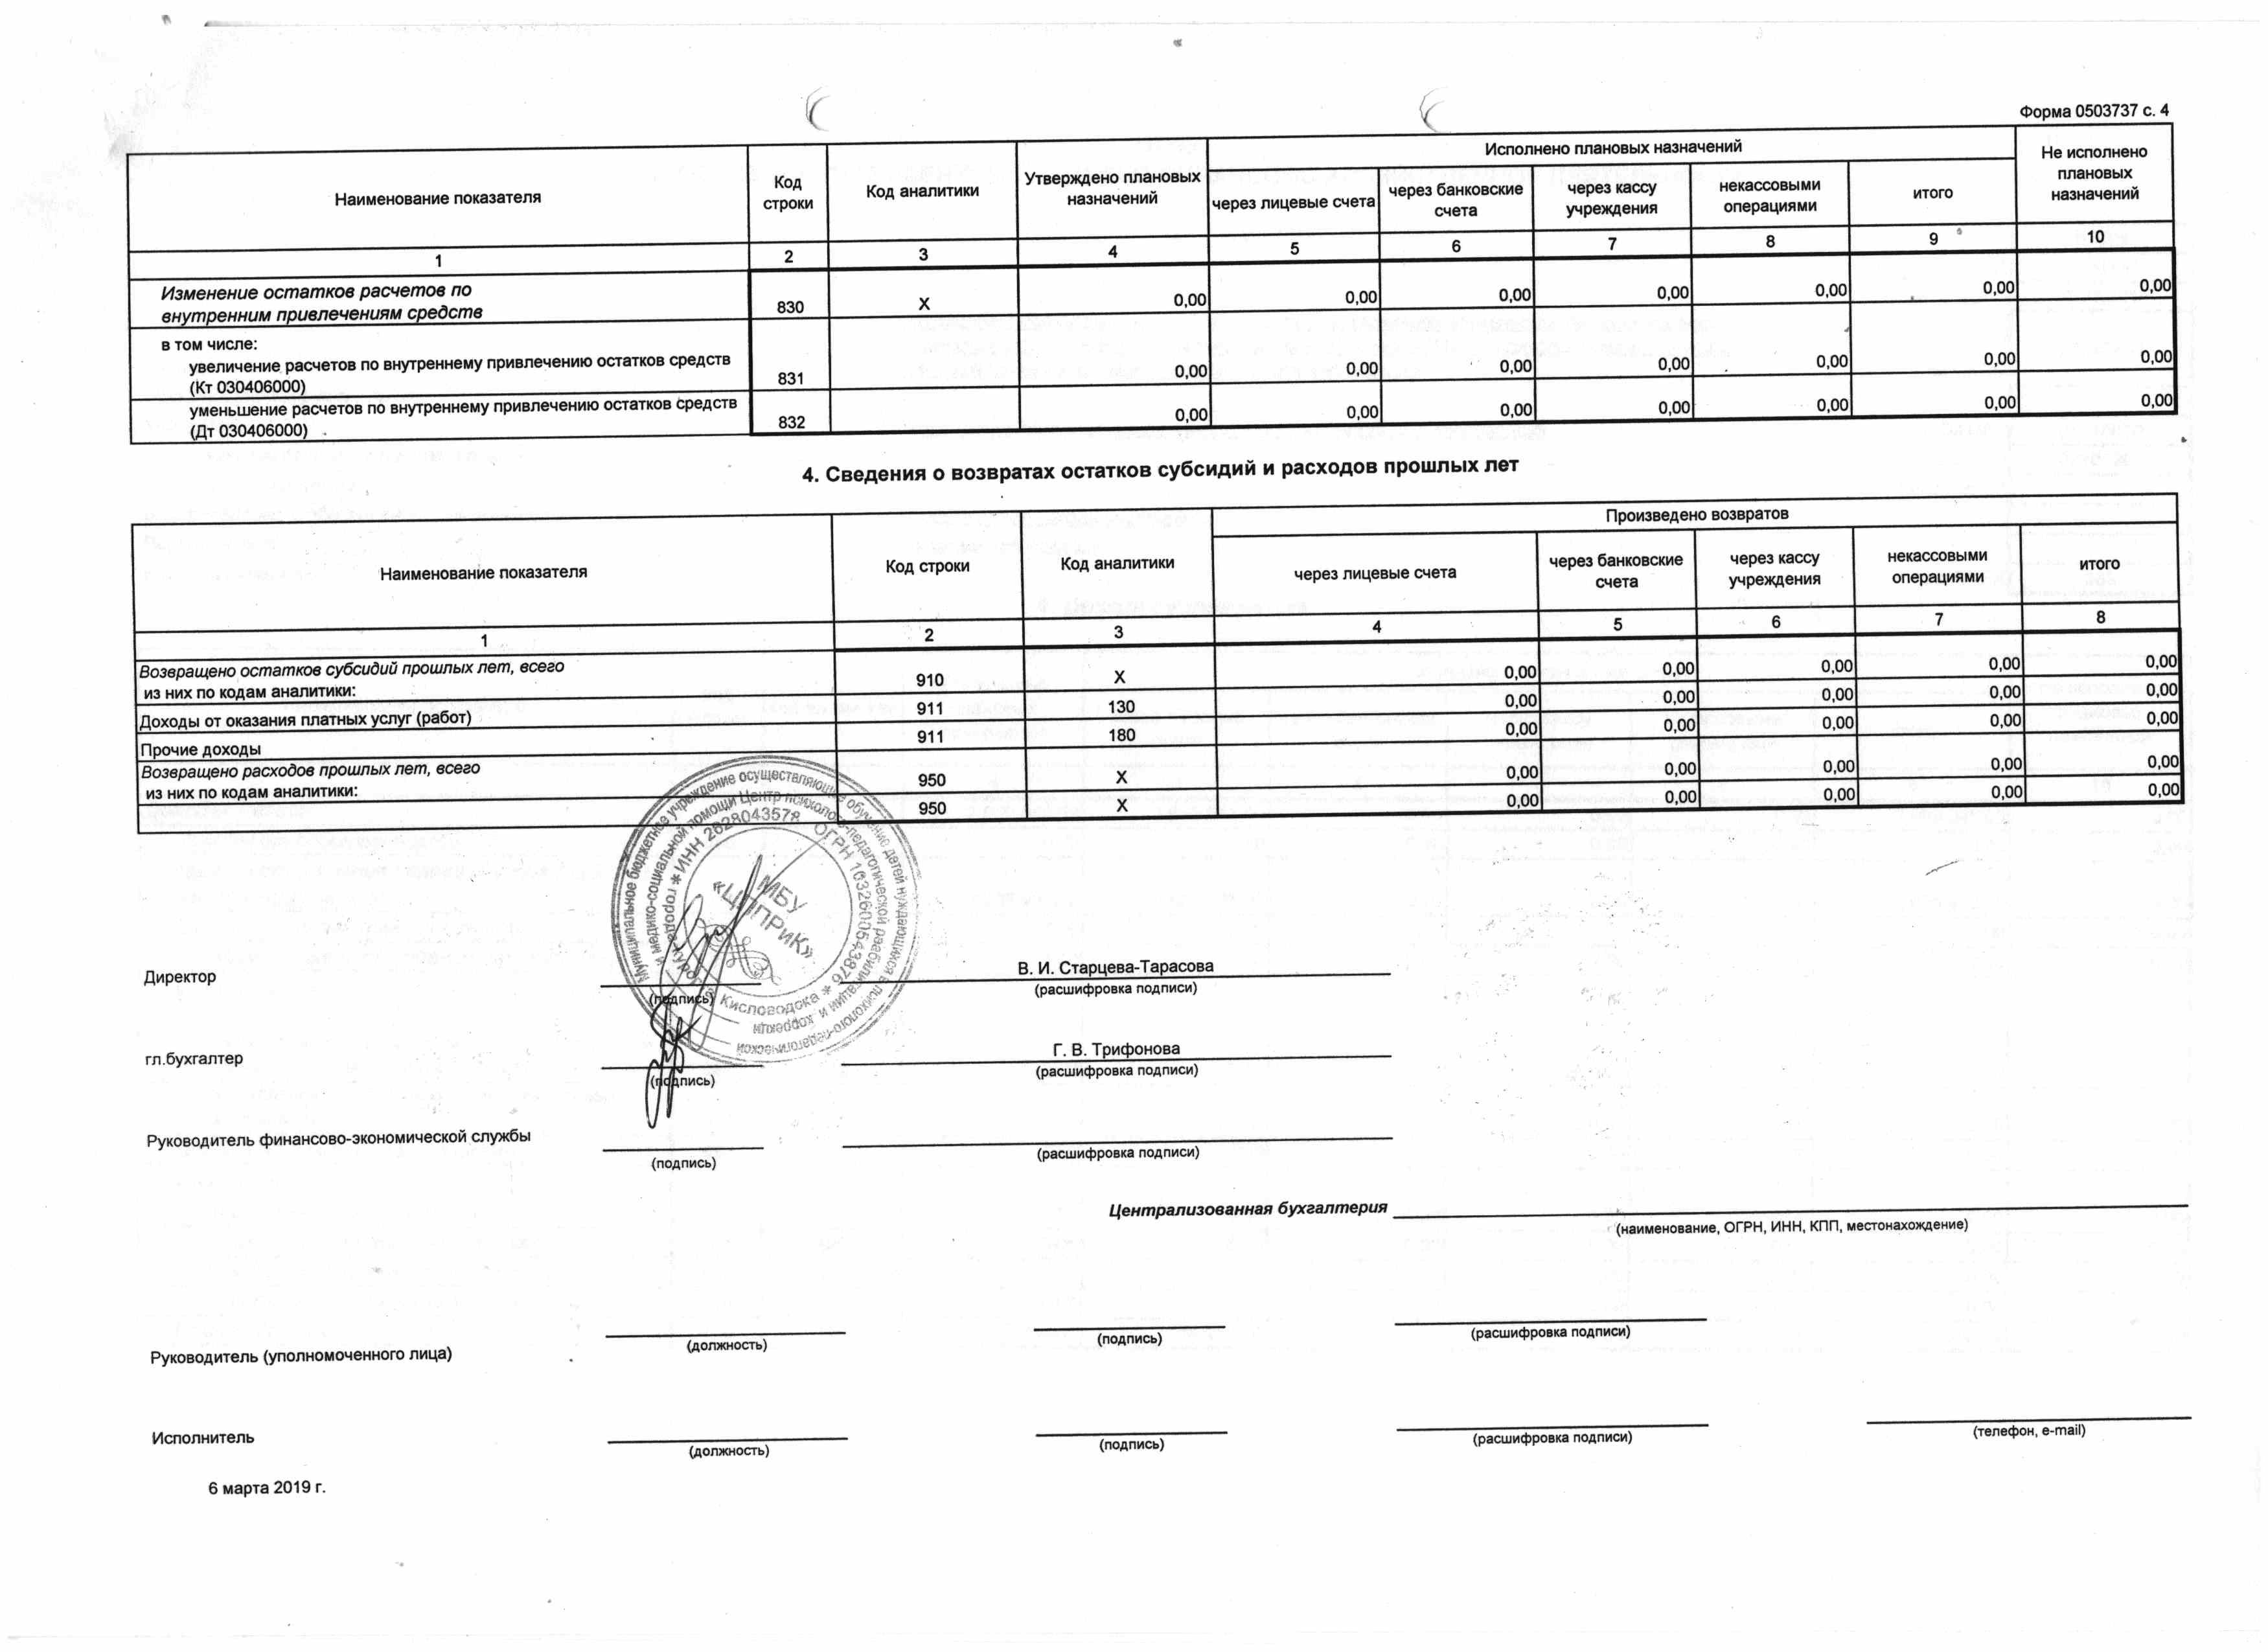 форма 737 Отчет плана ФХД доходы ЦППРиК 2018 4